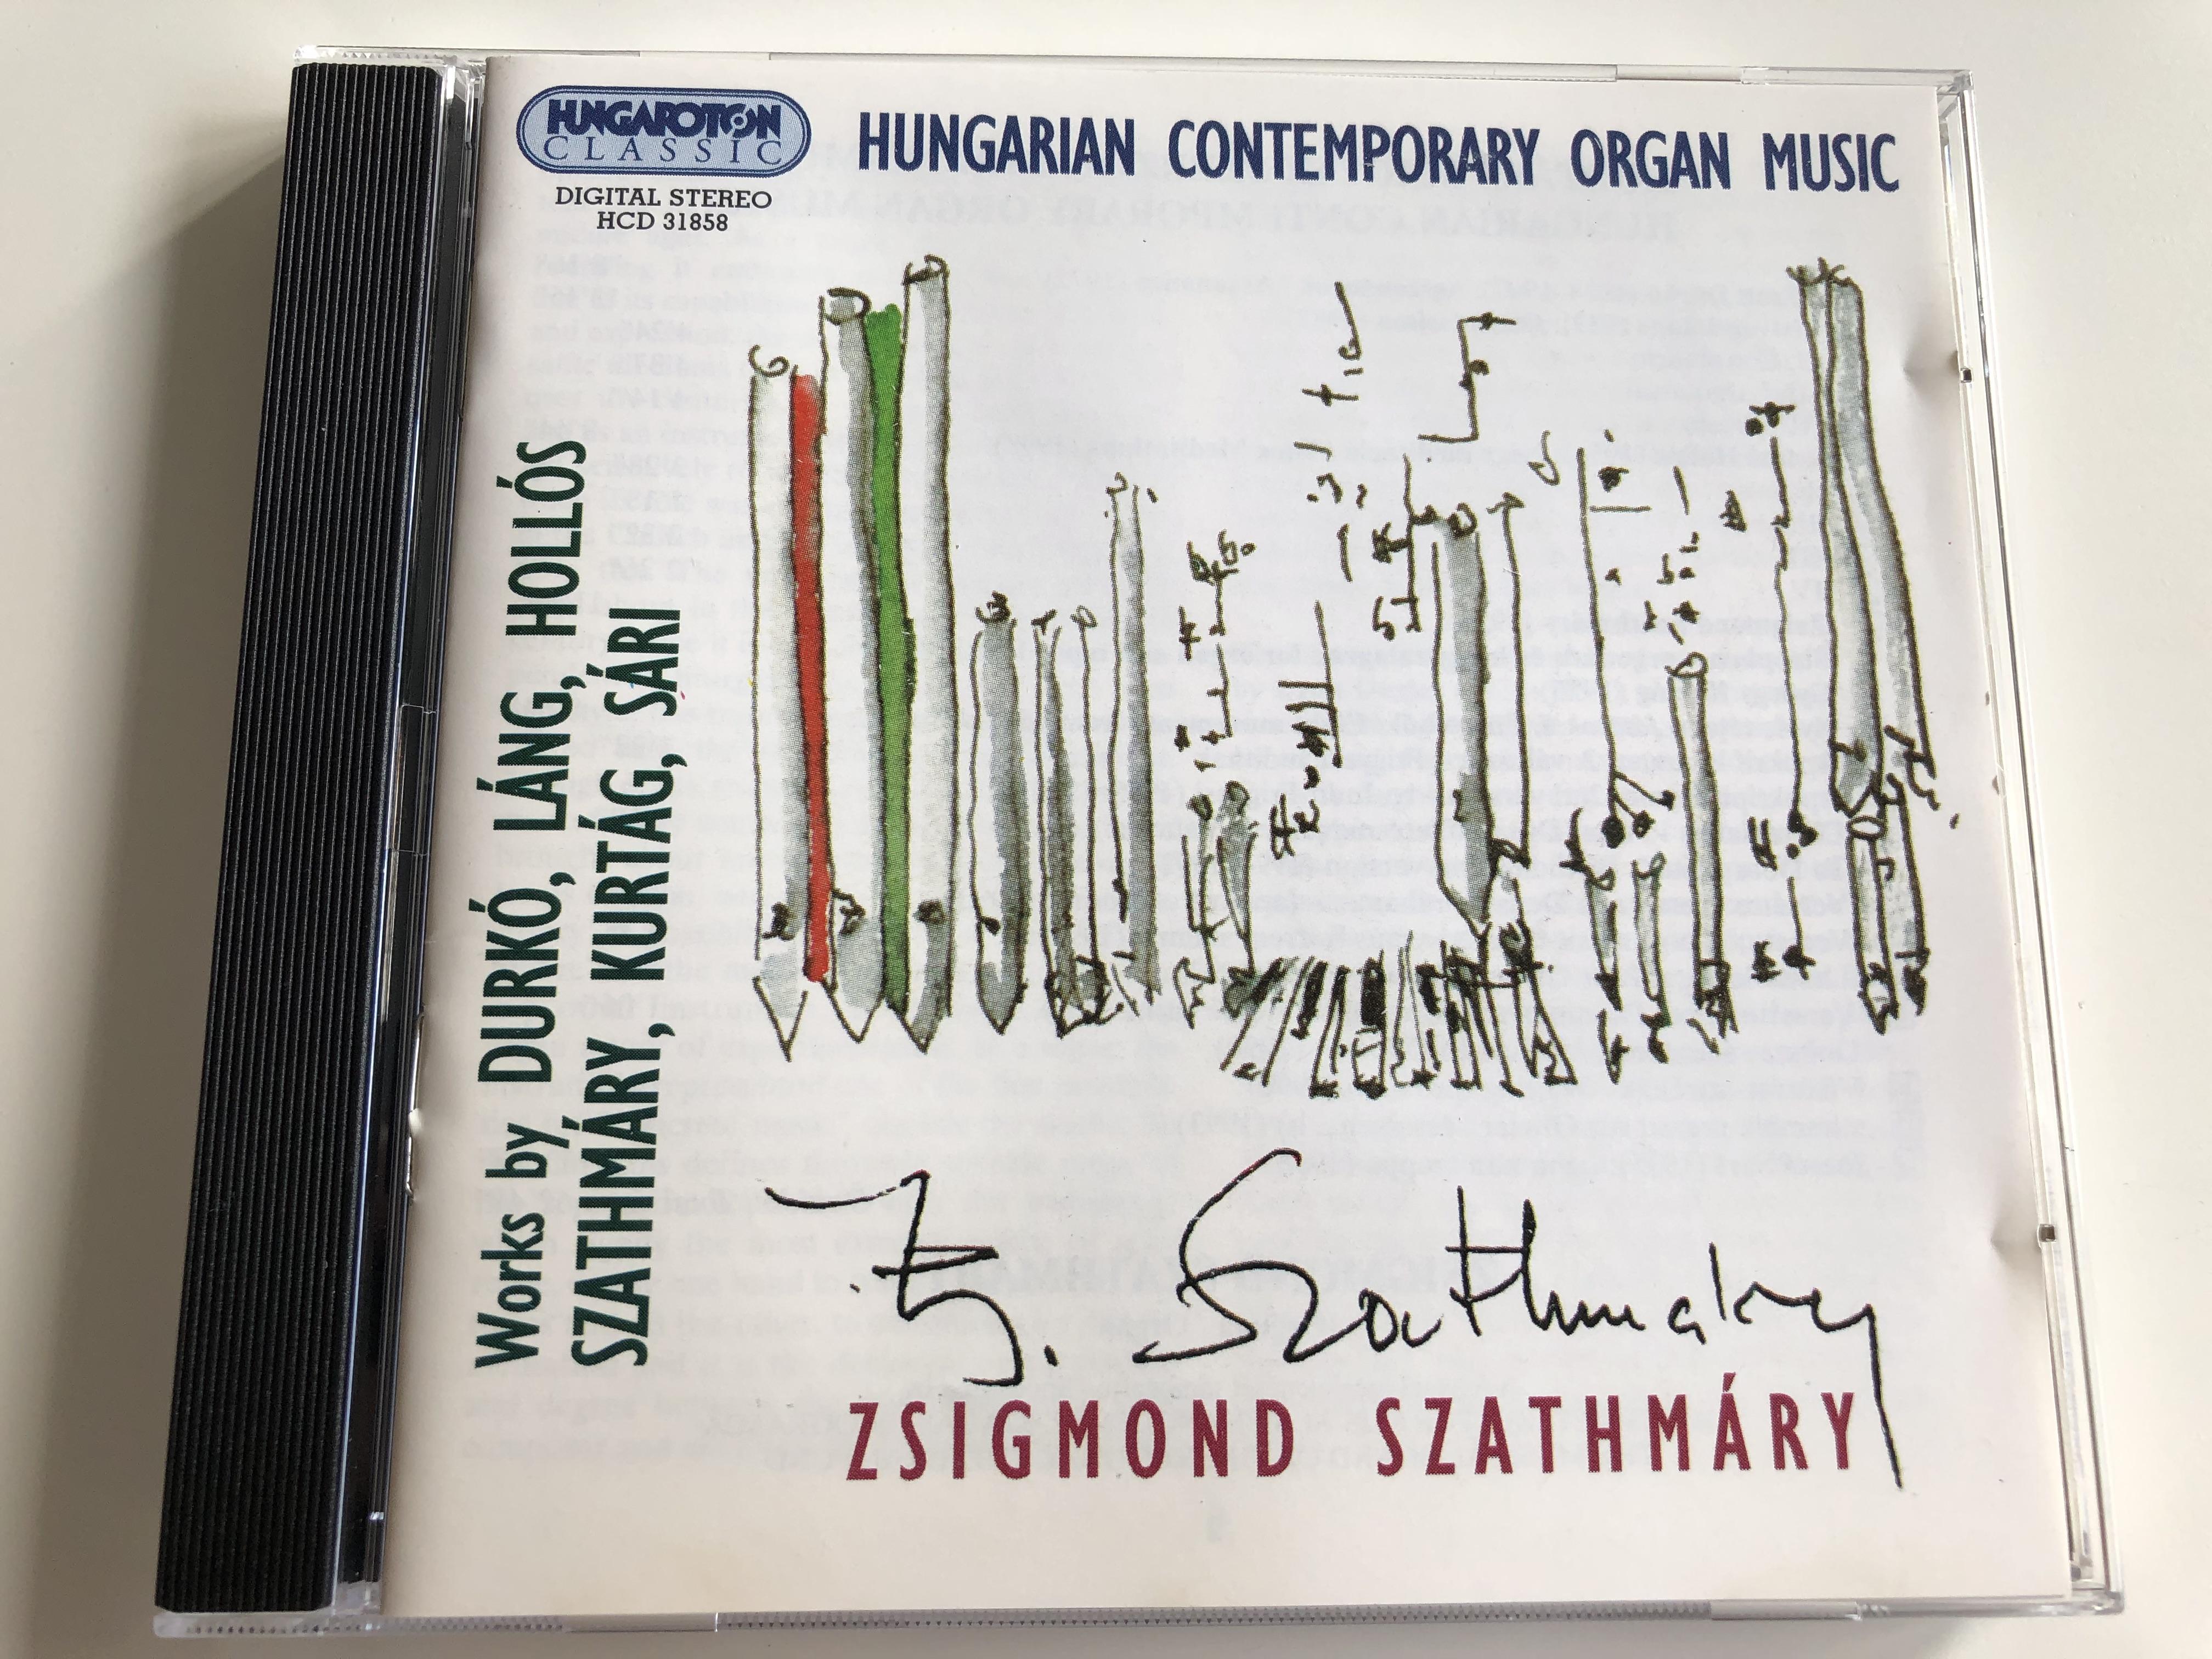 hungarian-contemporary-organ-music-works-by-durk-l-ng-holl-s-szathm-ry-kurt-g-s-ri-zsigmond-szathm-ry-hungaroton-classic-hcd-31858-audio-cd-1999-1-.jpg